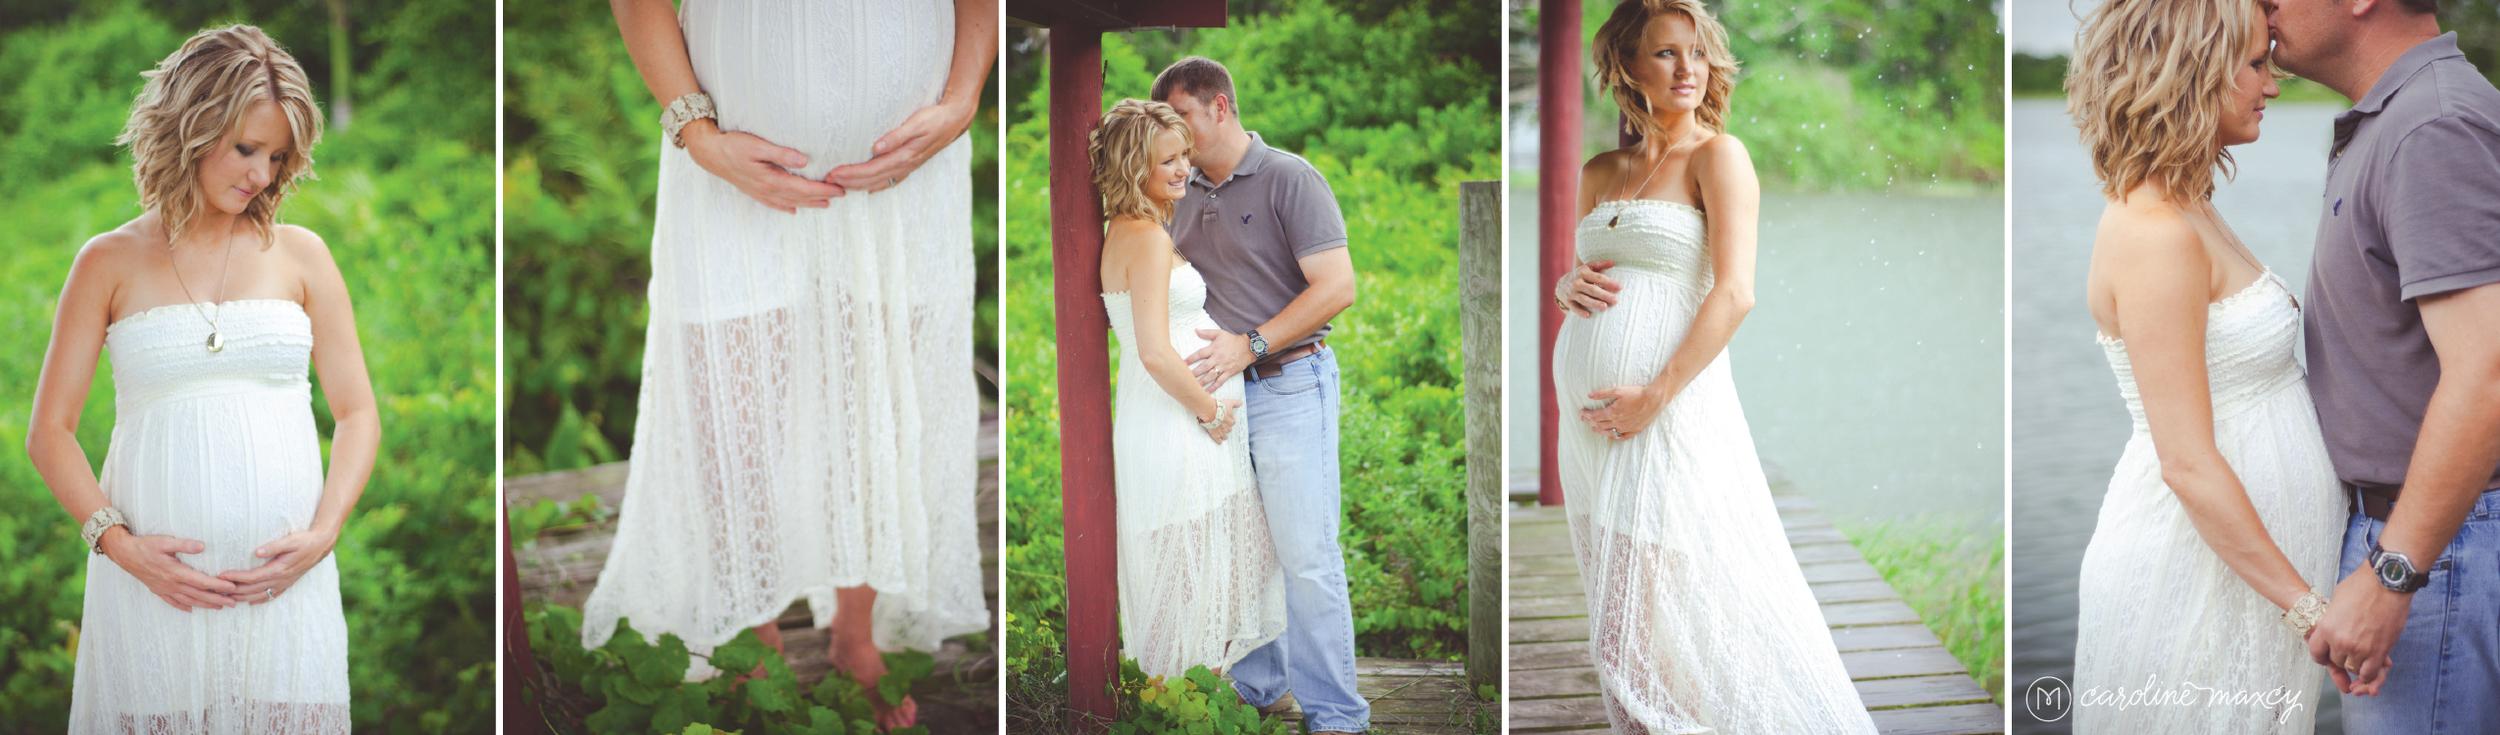 Caroline Maxcy Photography / Lake Placid, FL Maternity Photography